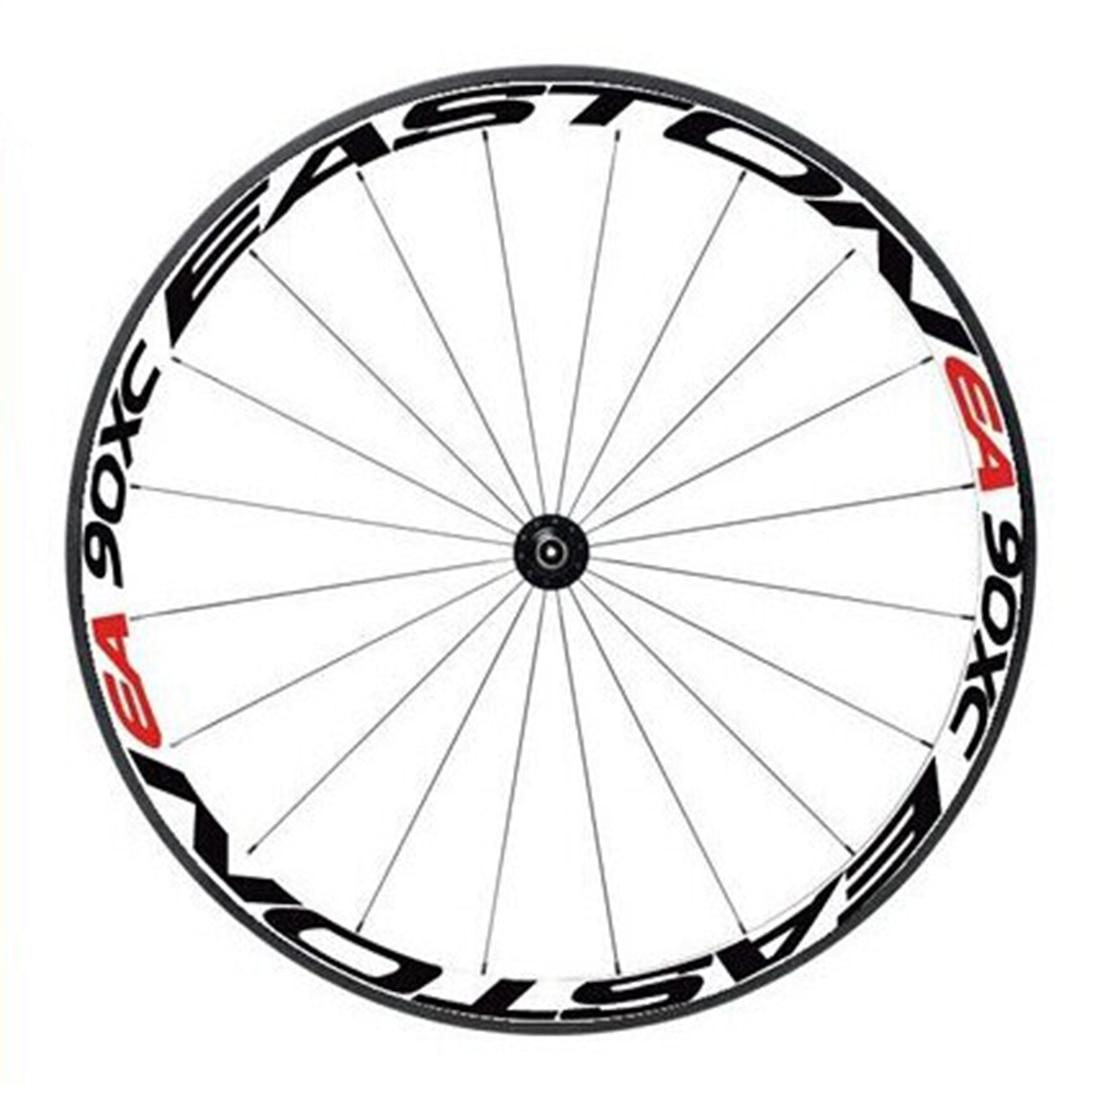 Popular Bike Wheel Decals Buy Cheap Bike Wheel Decals Lots